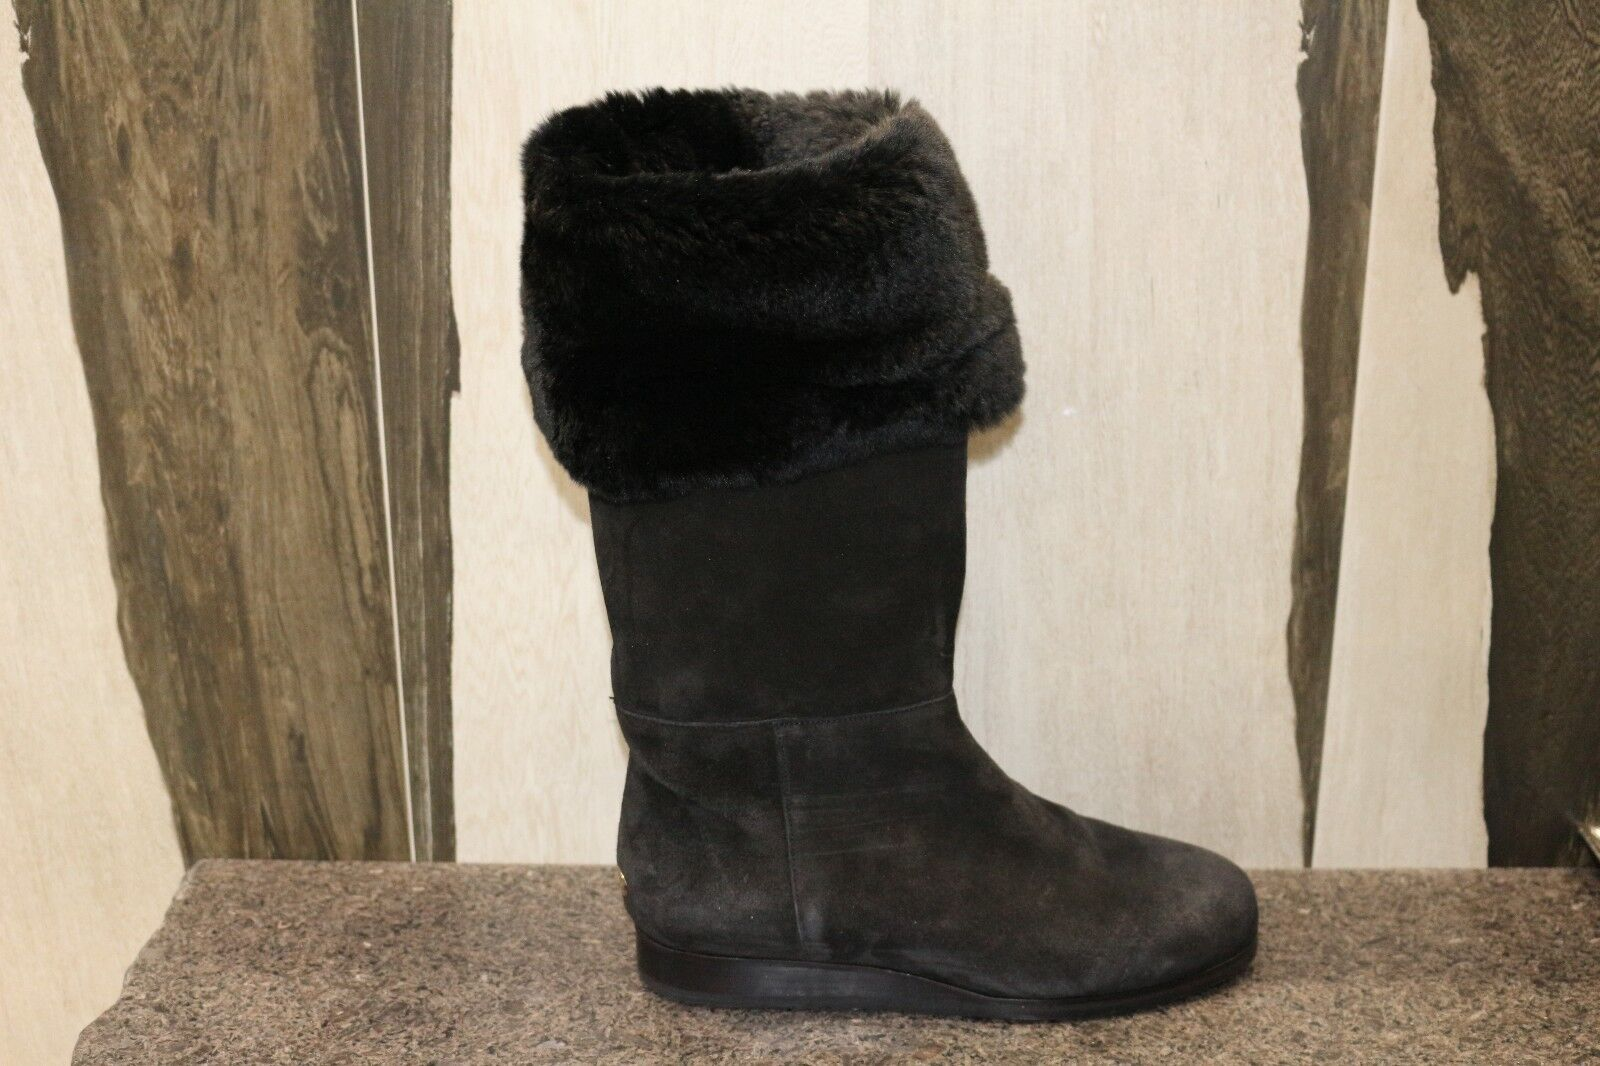 NIB Jimmy Choo DARA SUE RABBIT LINED BLACK SUEDE FOLD FLAT WEDGE BOOTS Shoes 37